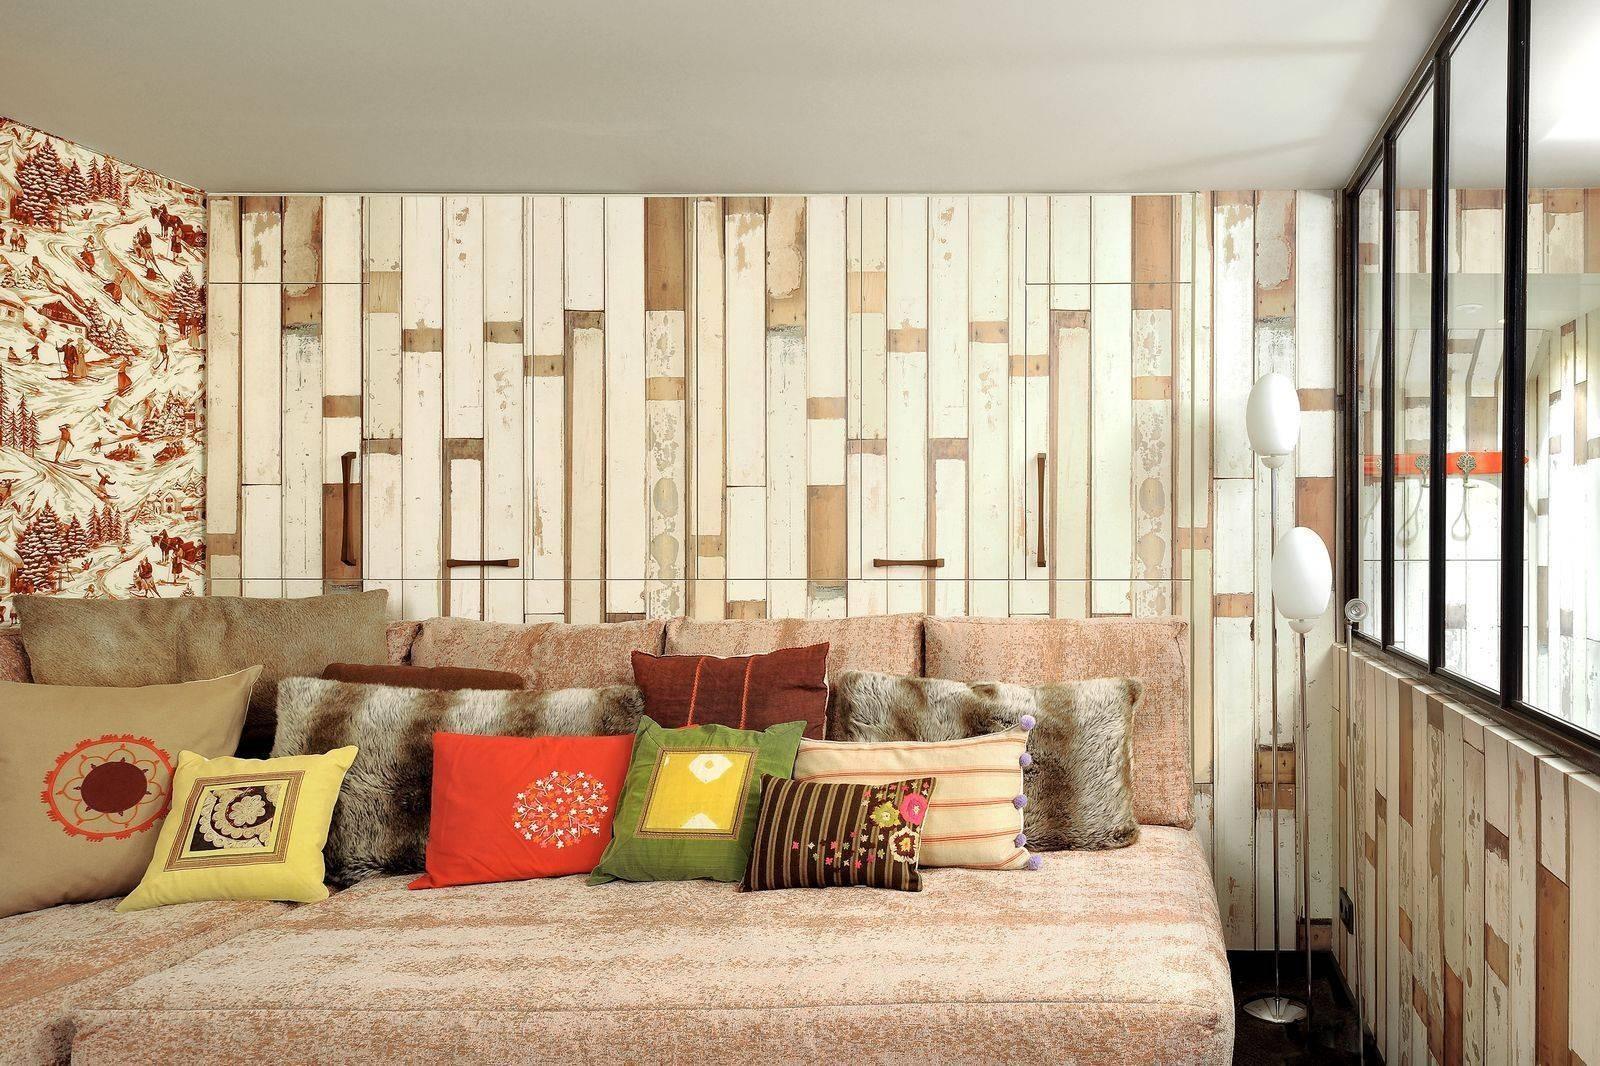 Courchevel 1550 Luxury Rental Chalet Niibite Living Room 3